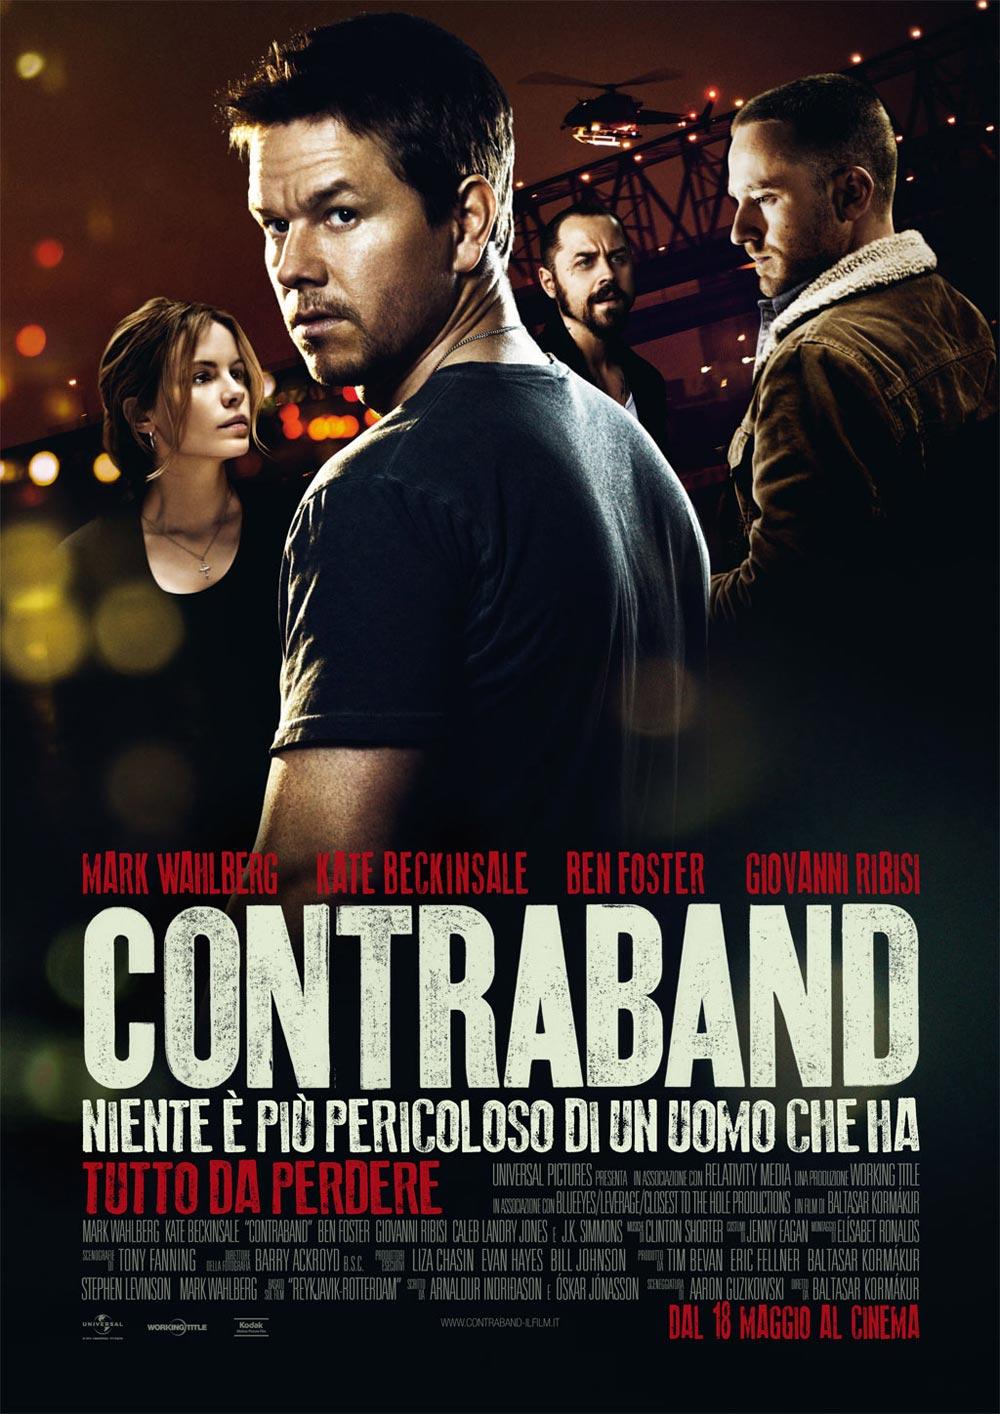 Contraband 2012 Movie Review – Contr...